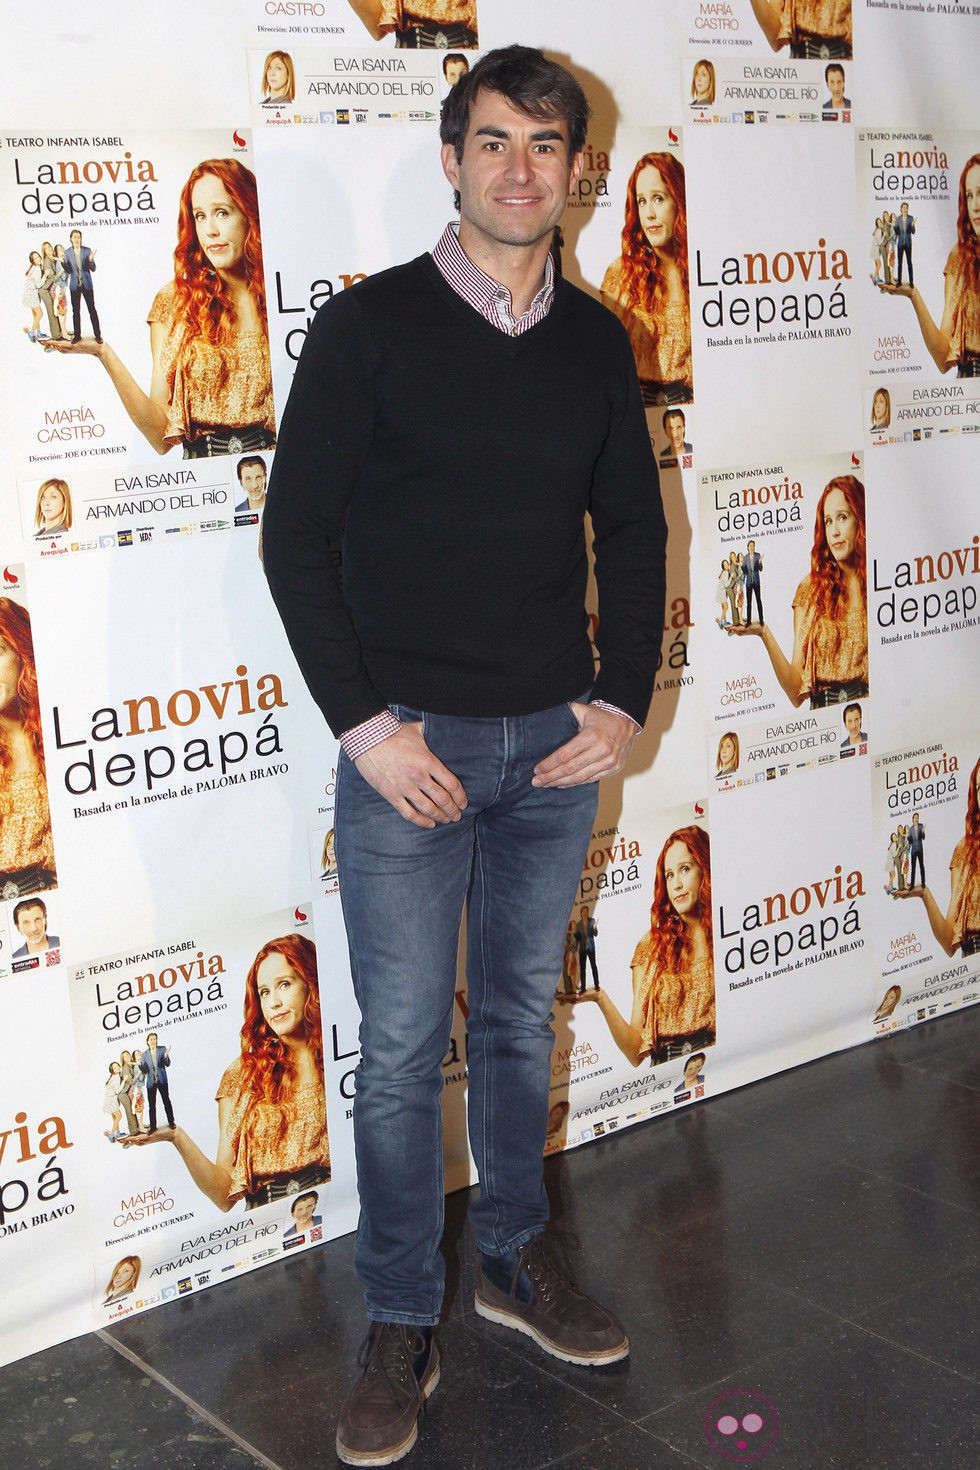 Daniel Muriel en el estreno de la obra de teatro 'La novia de papá'